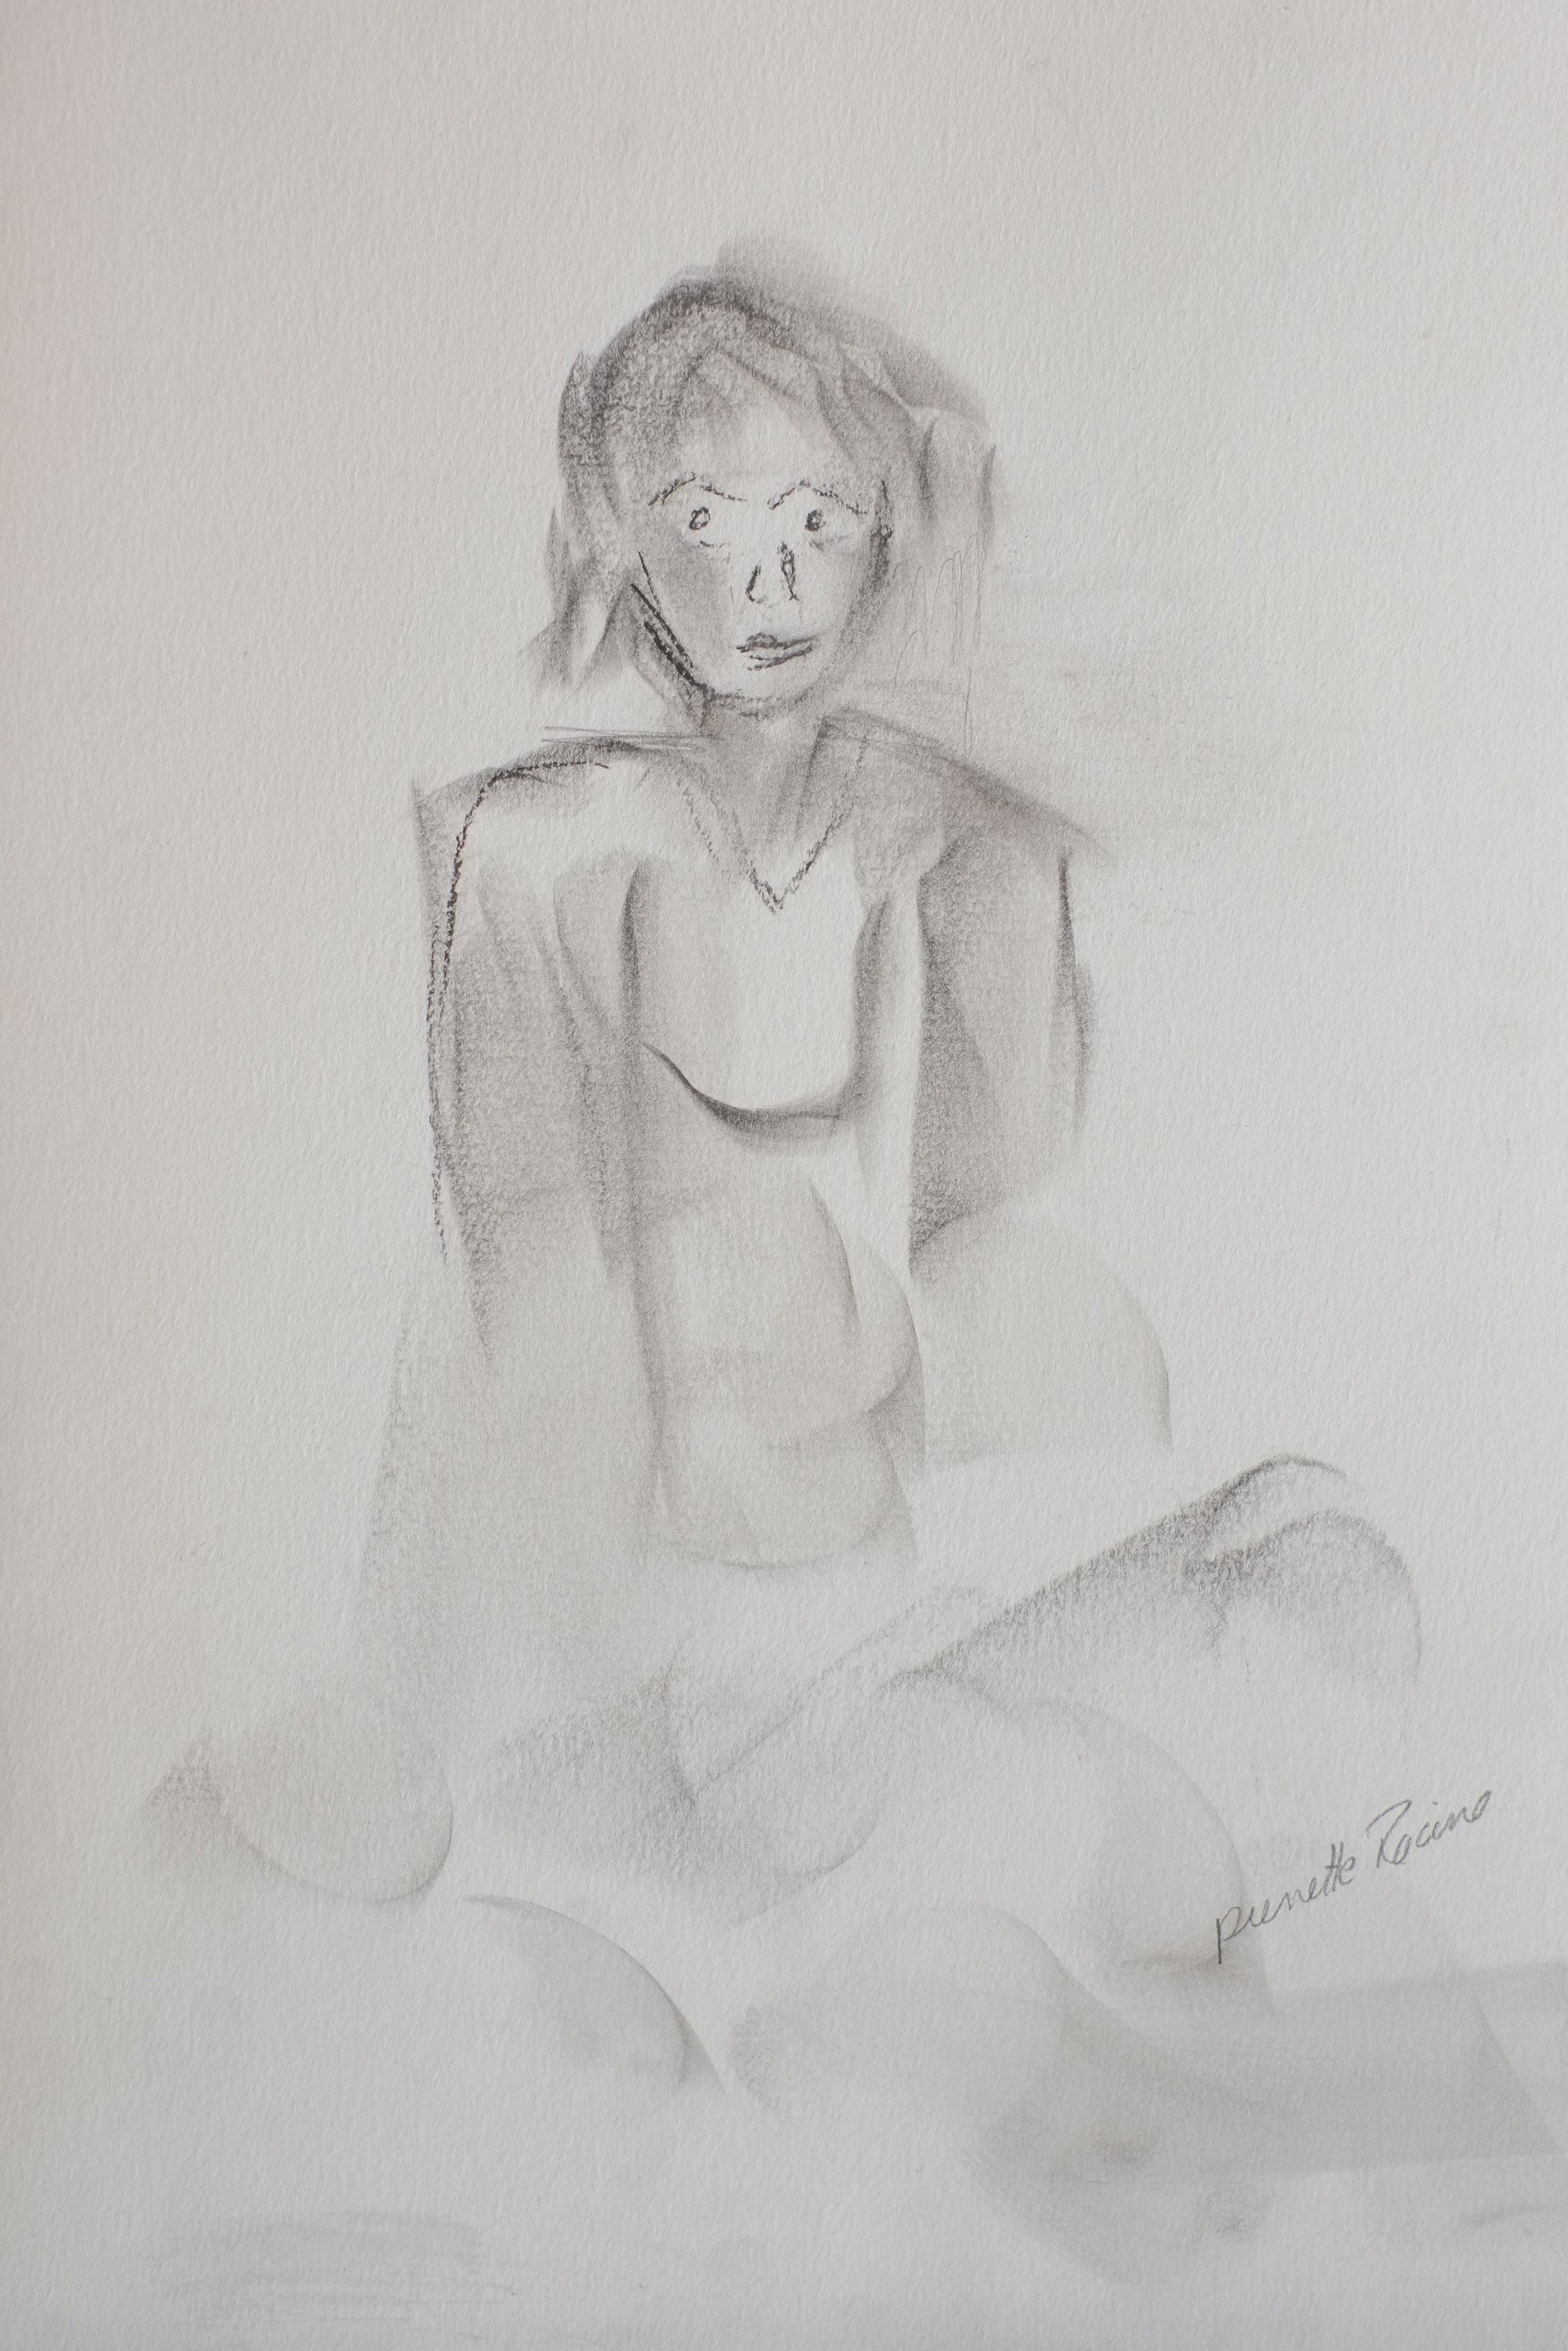 Pierrette Racine